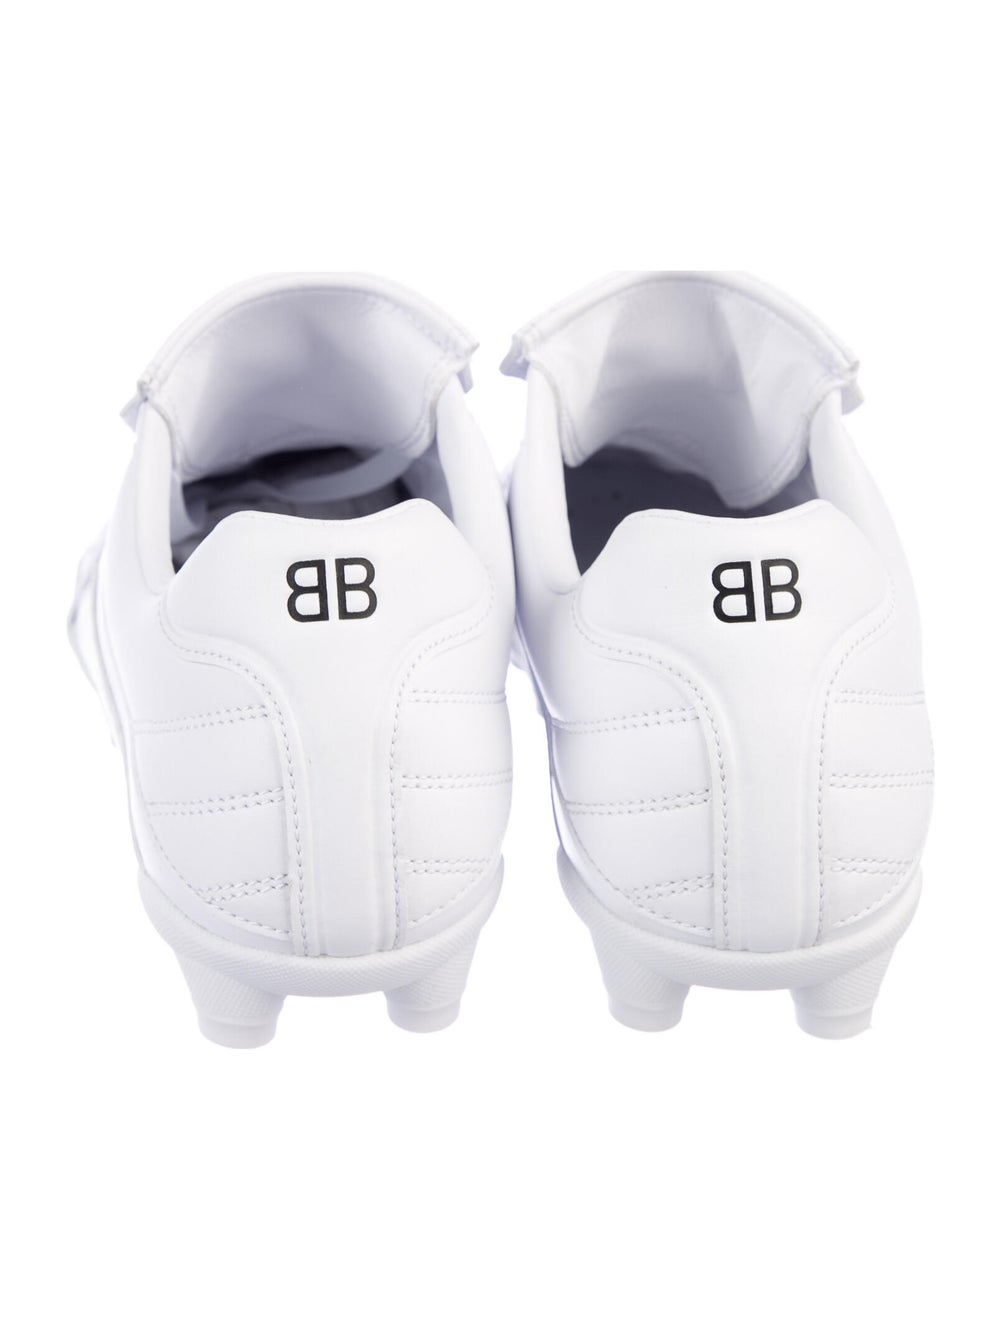 Balenciaga Soccer Sneakers Sneakers White - image 4